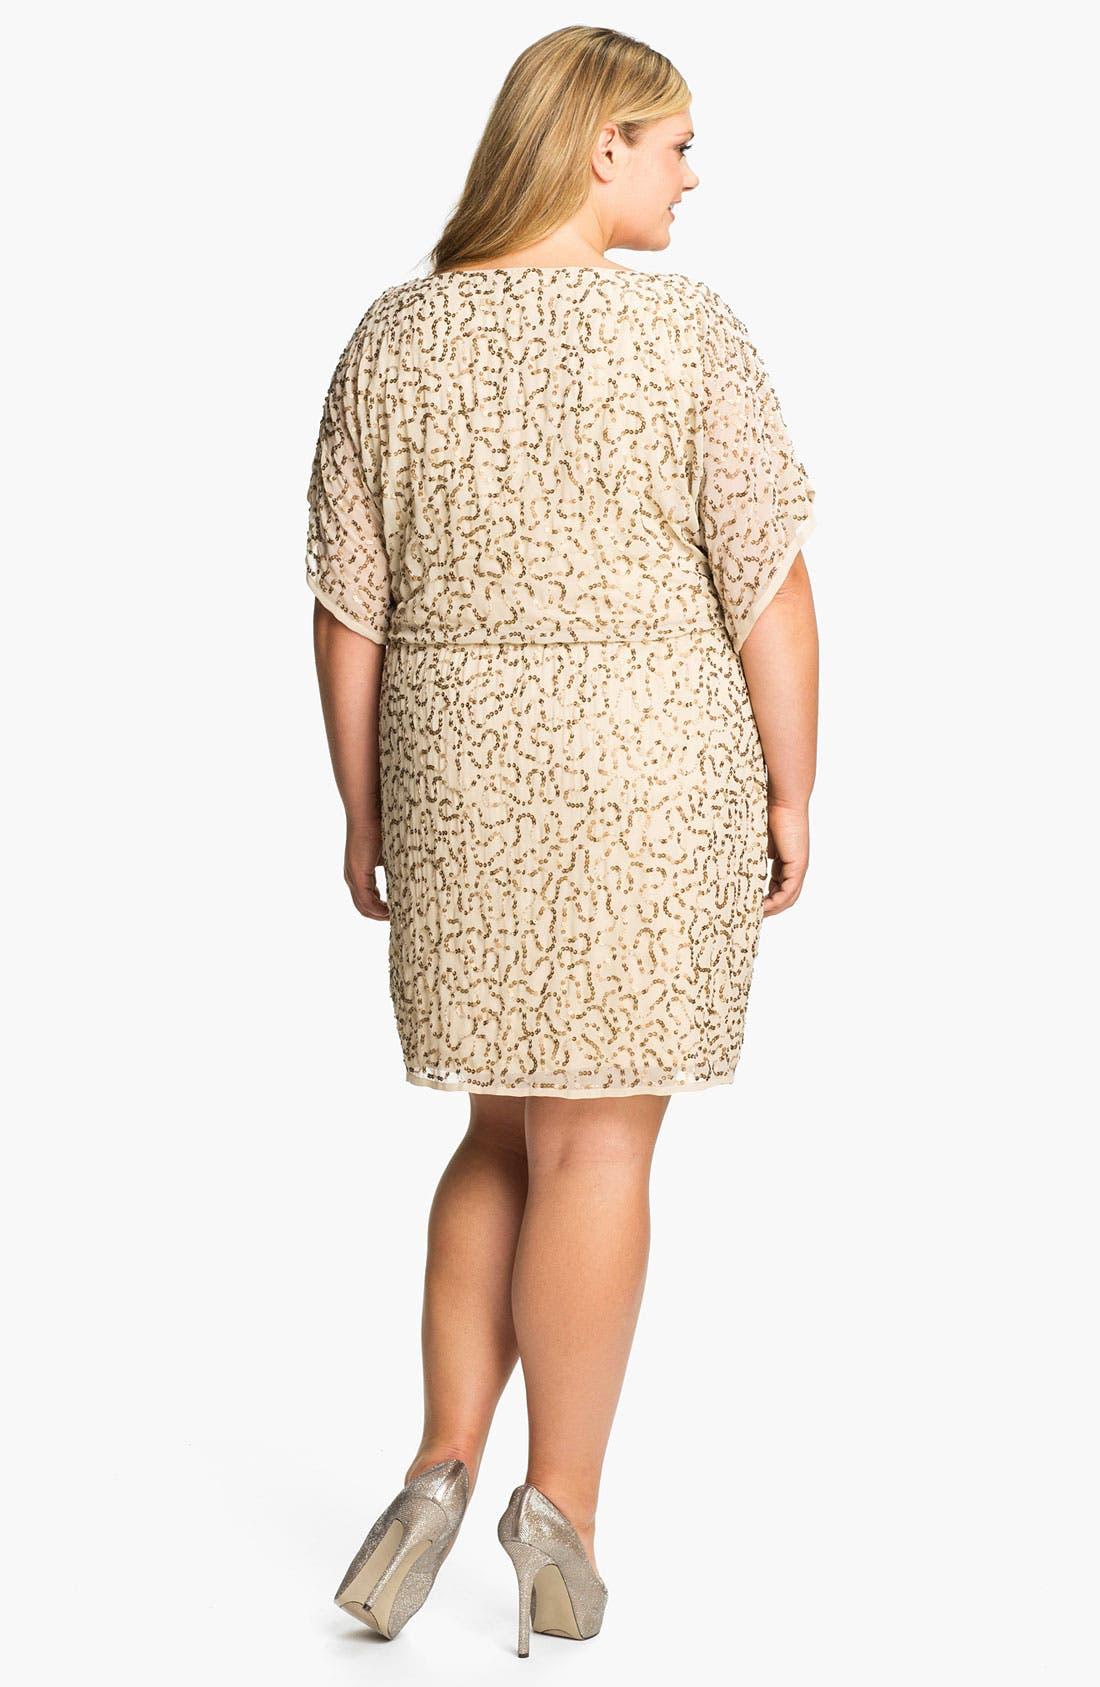 Alternate Image 2  - Adrianna Papell Sequined Chiffon Blouson Dress (Plus)